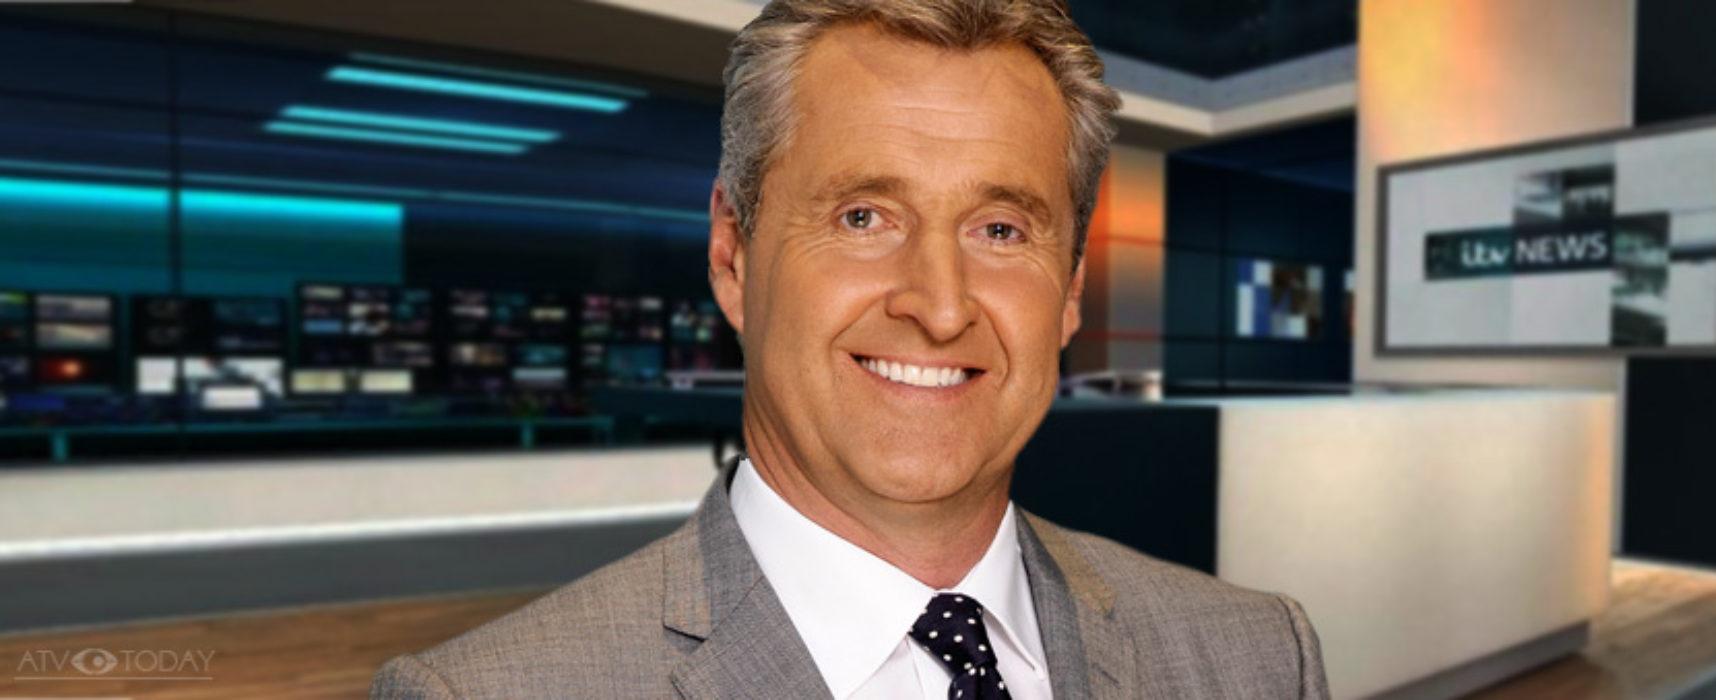 Mark Austin joins Sky News as US Correspondent